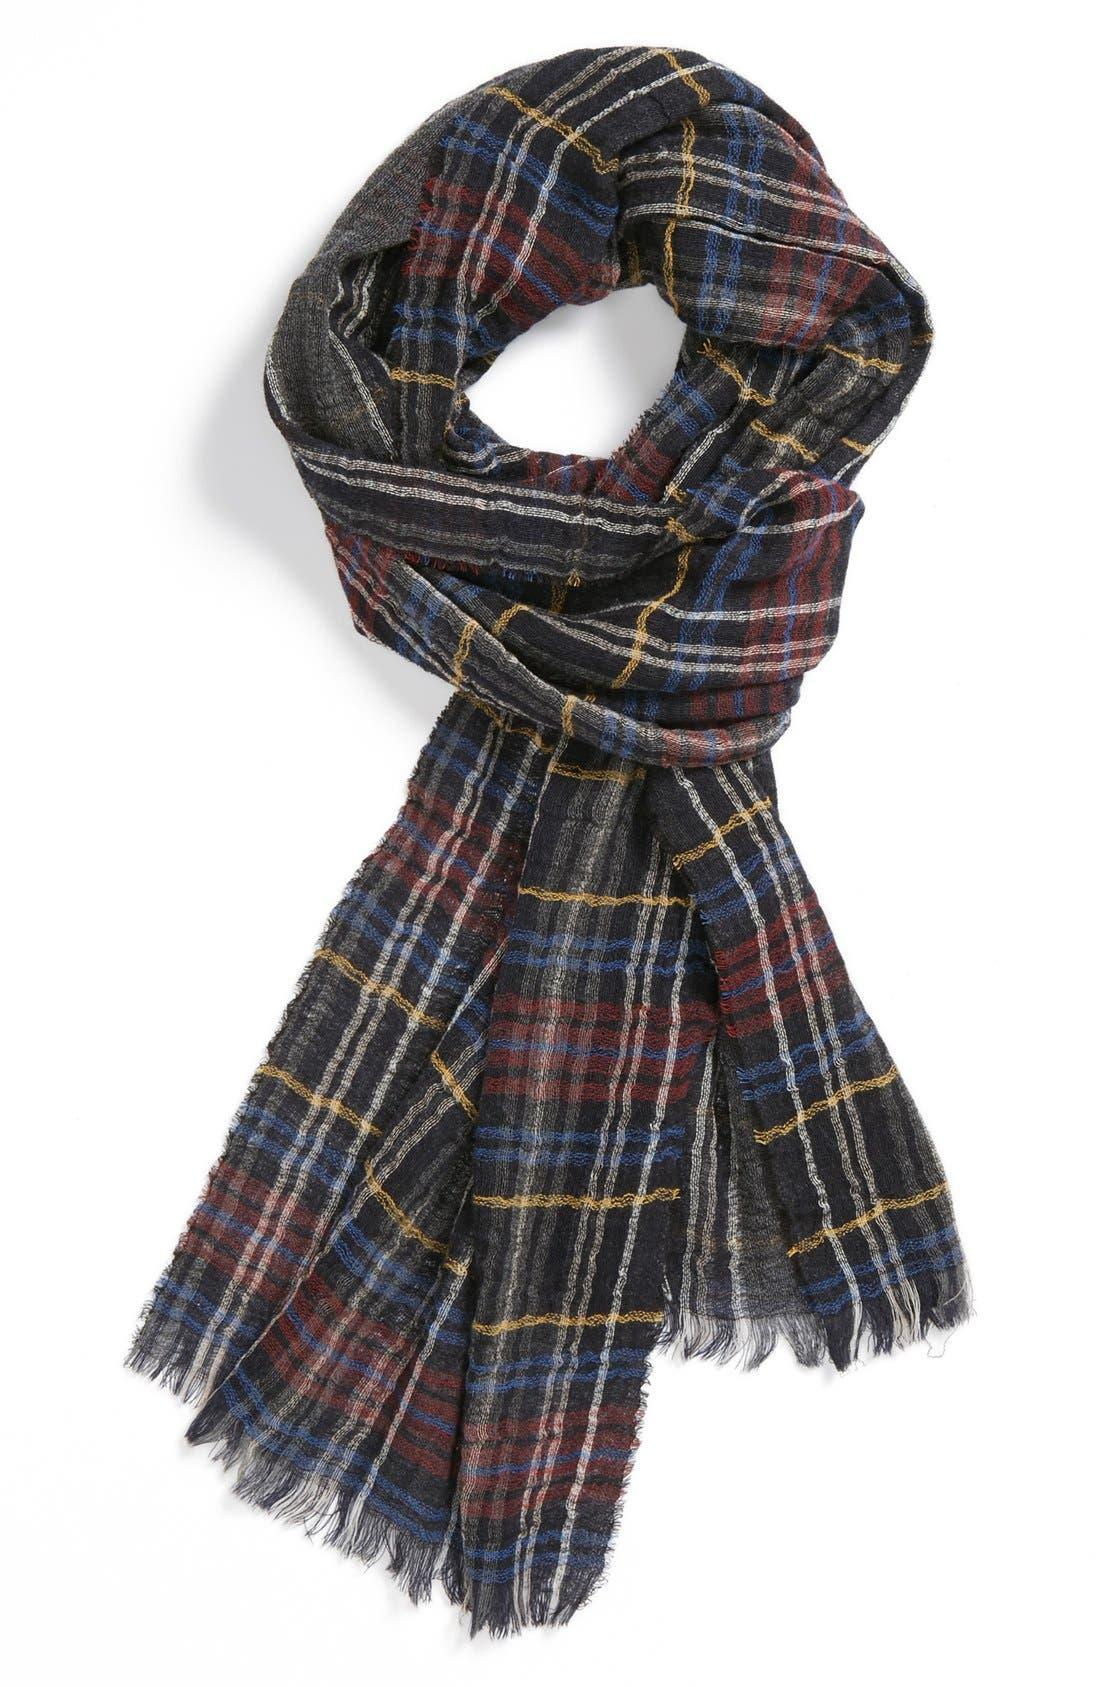 Alternate Image 1 Selected - rag & bone 'Highland' Scarf